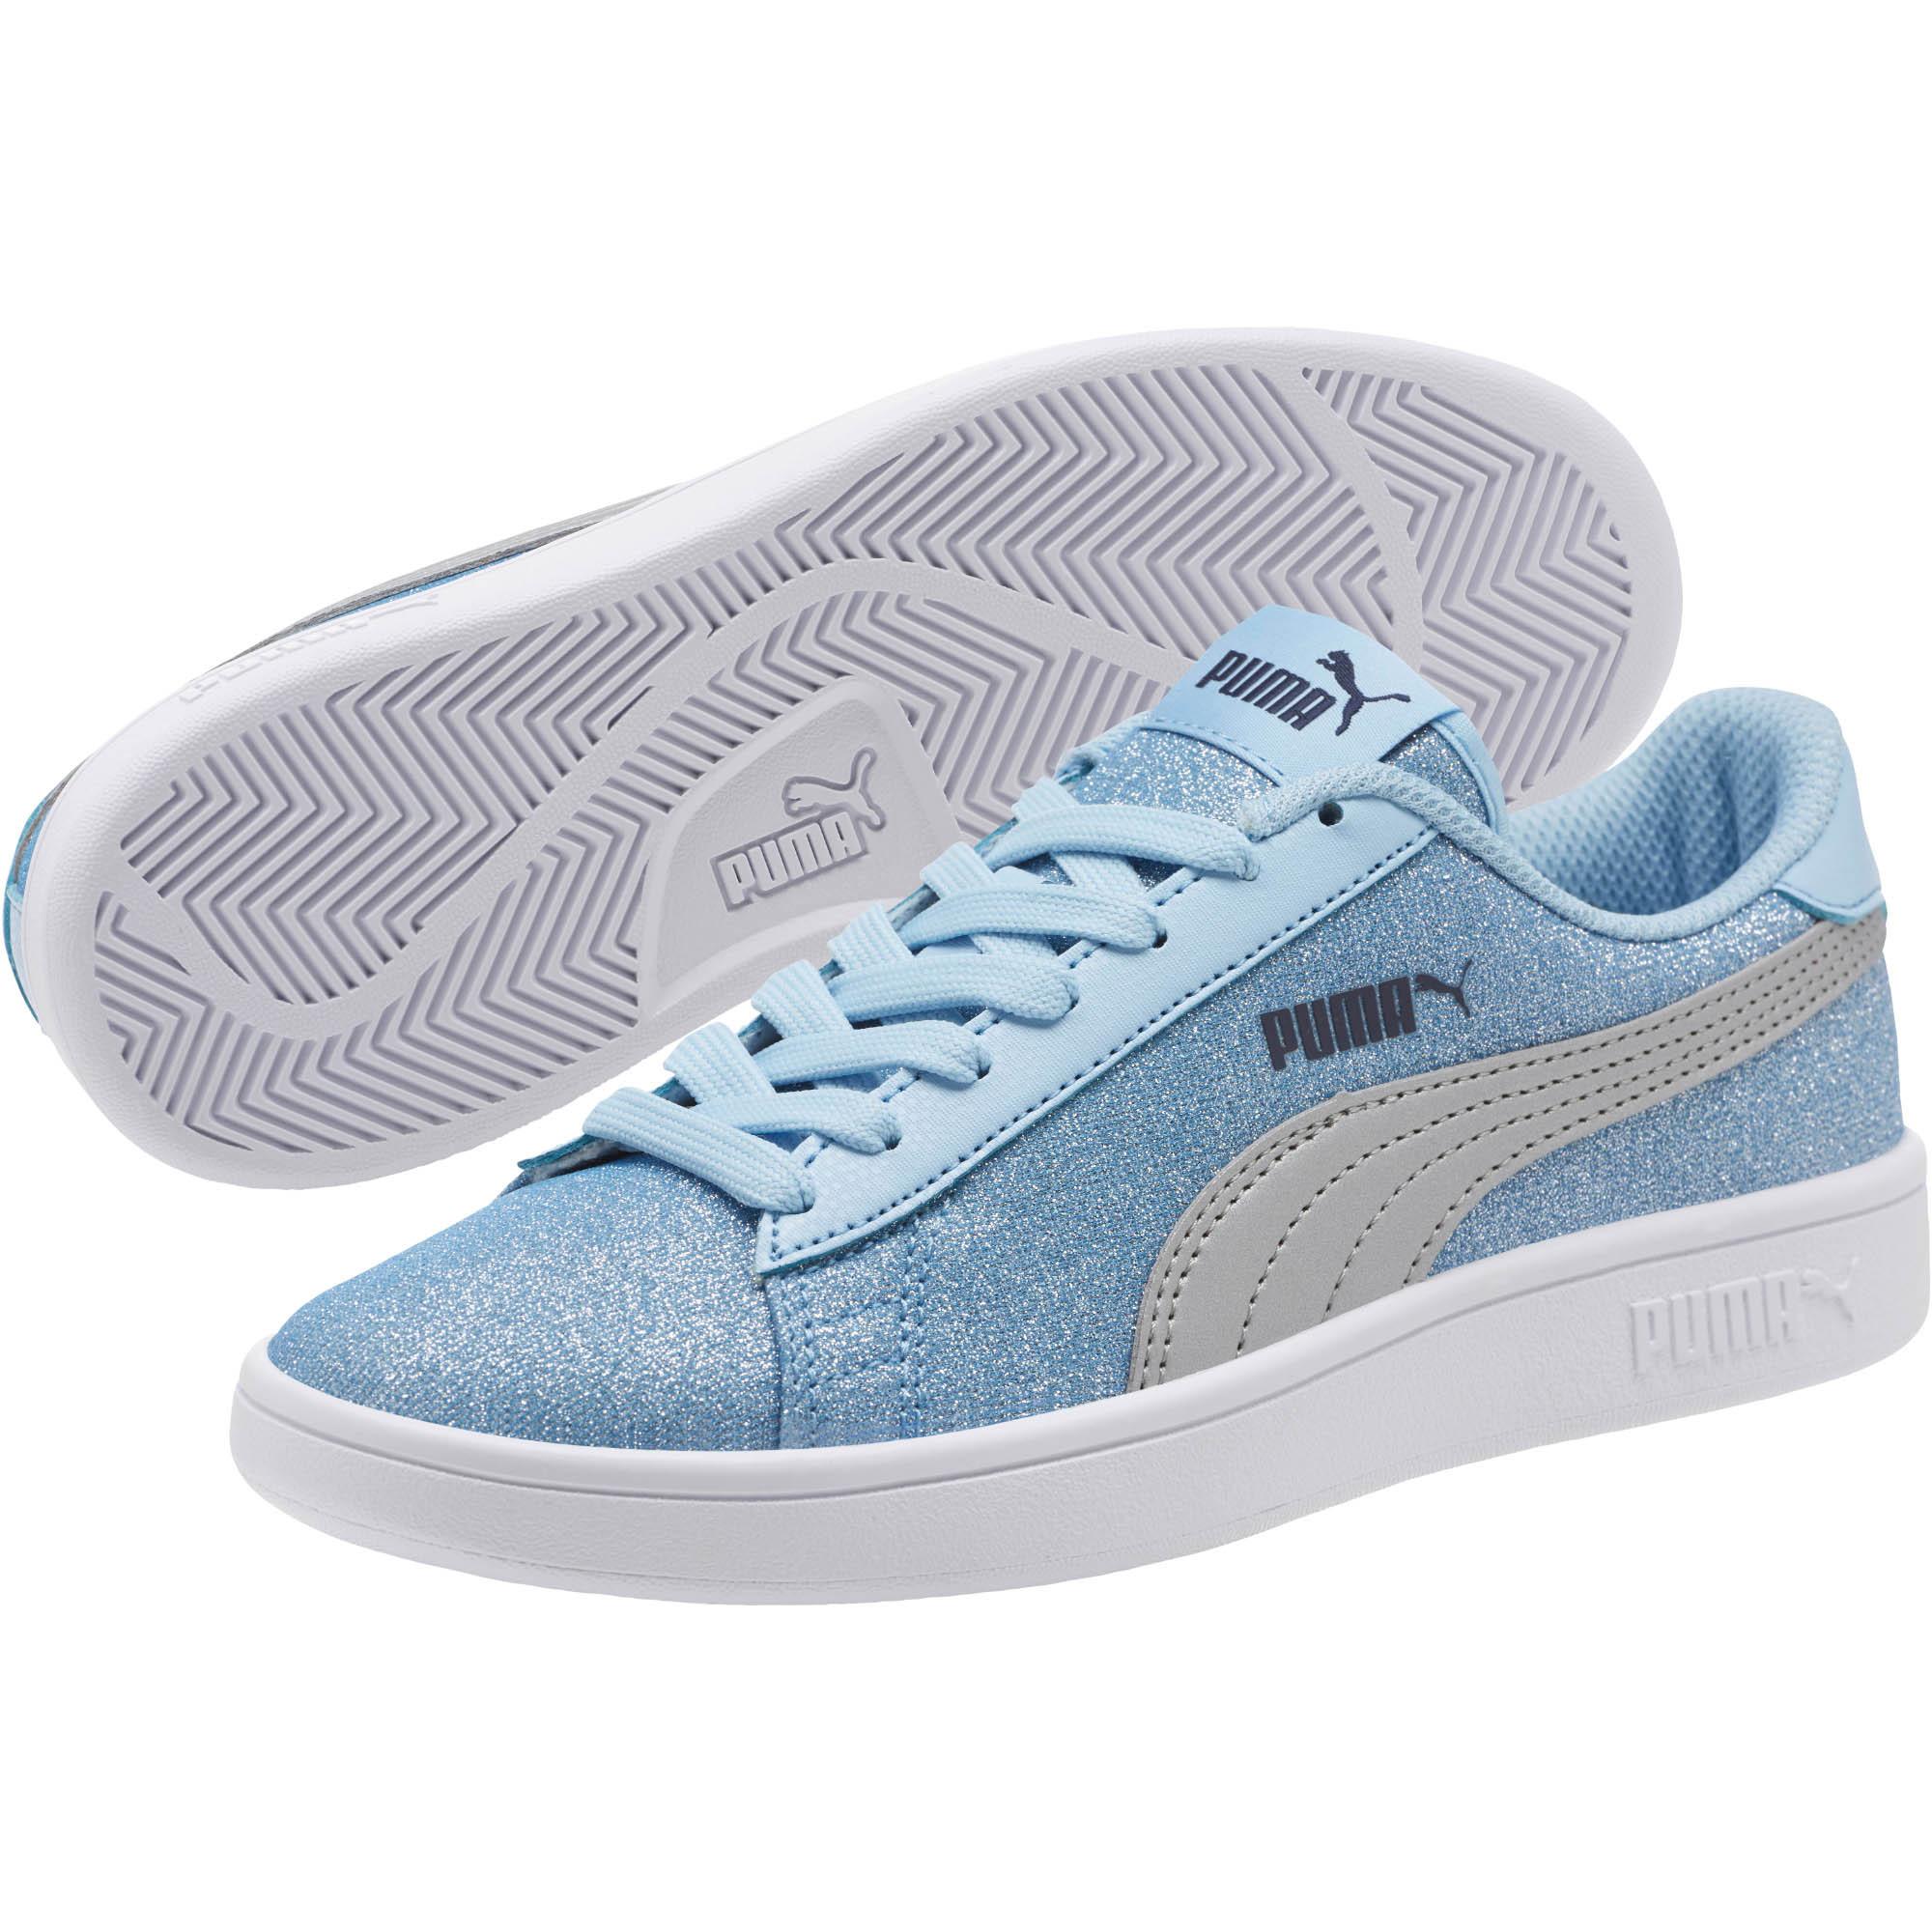 Official Puma Store  PUMA Smash v2 Glitz Glam JR Sneakers  8b86563b2